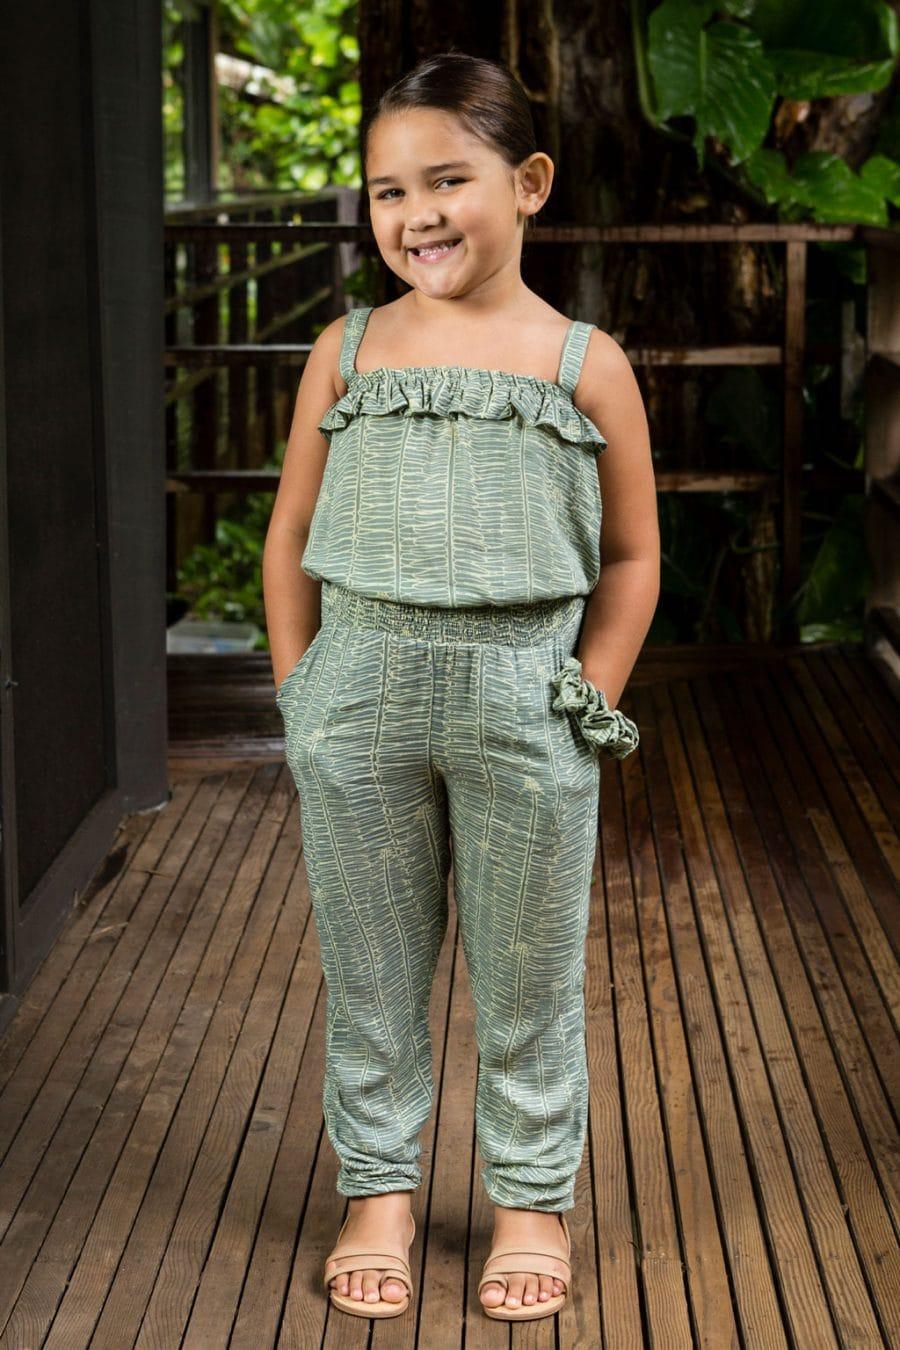 Child wearing top penny in Lily Pad Margarita Kupukupu pattern